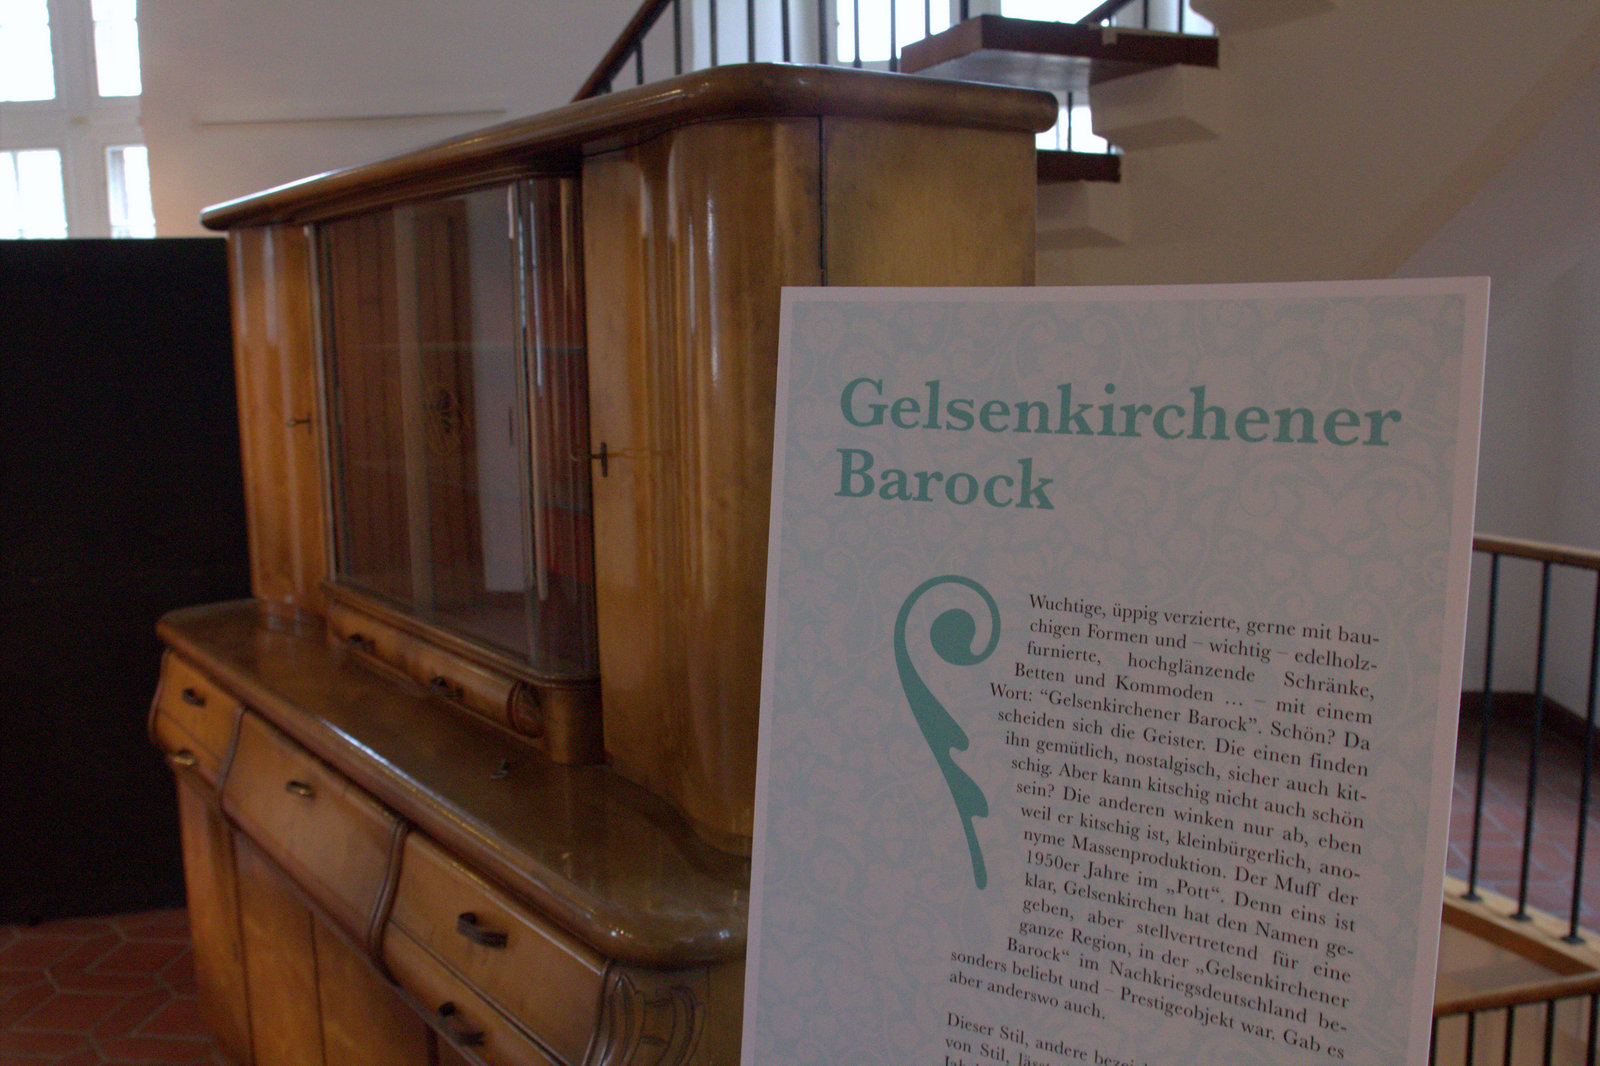 gelsenkirchener barock bilder